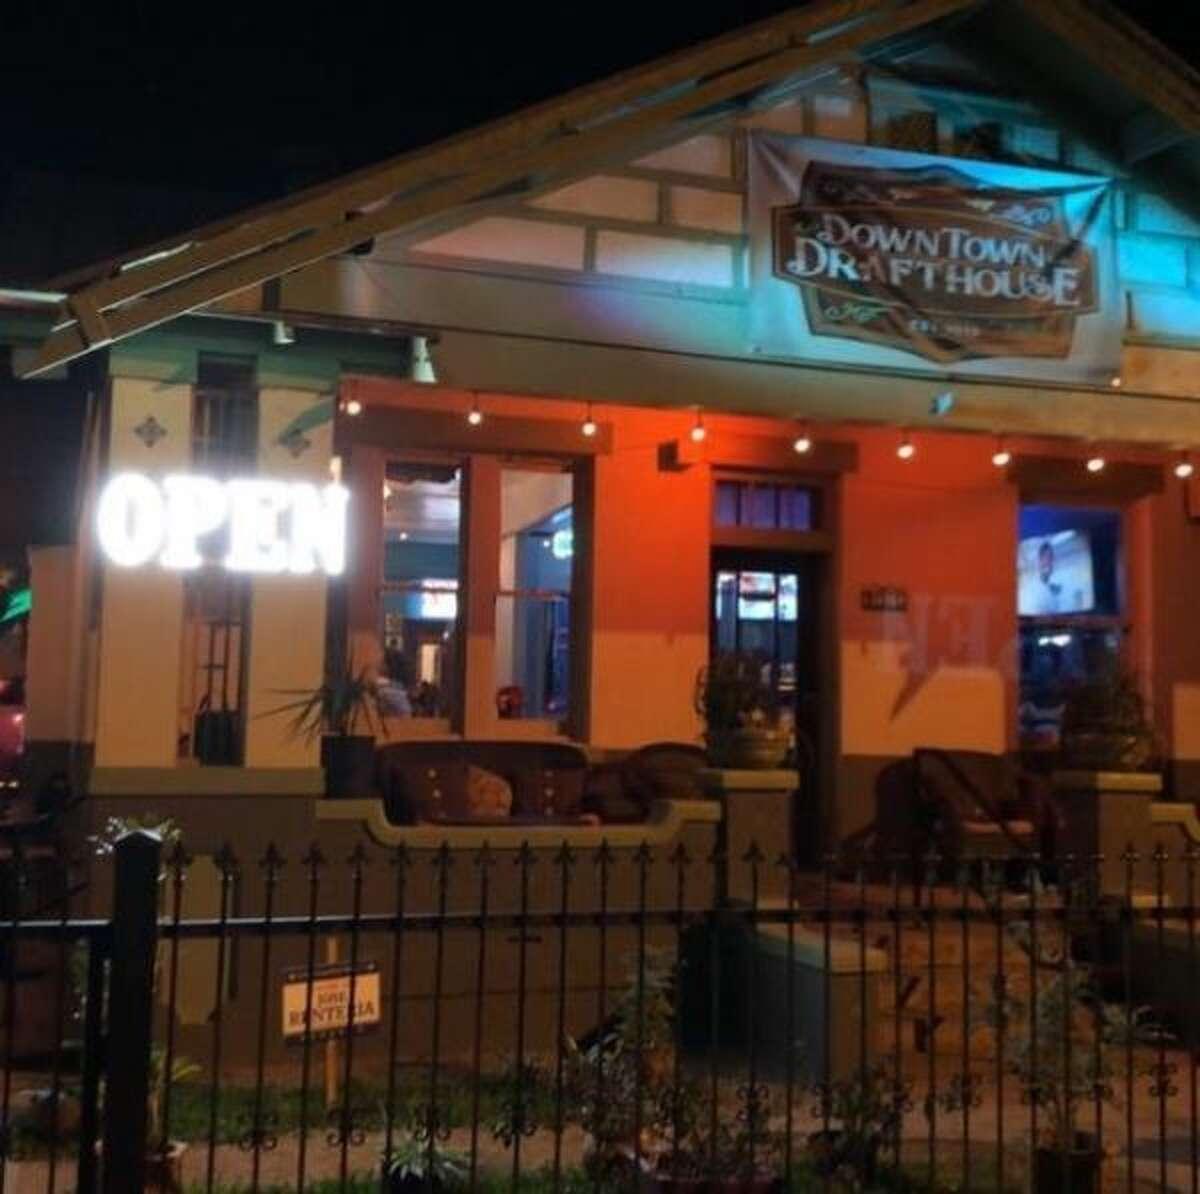 Downtown Drafthouse, 811 Iturbide St. 2 p.m.: GCPA Lottery 4:15 p.m.: EM&M'S 6 p.m.: Blue Sock Trio